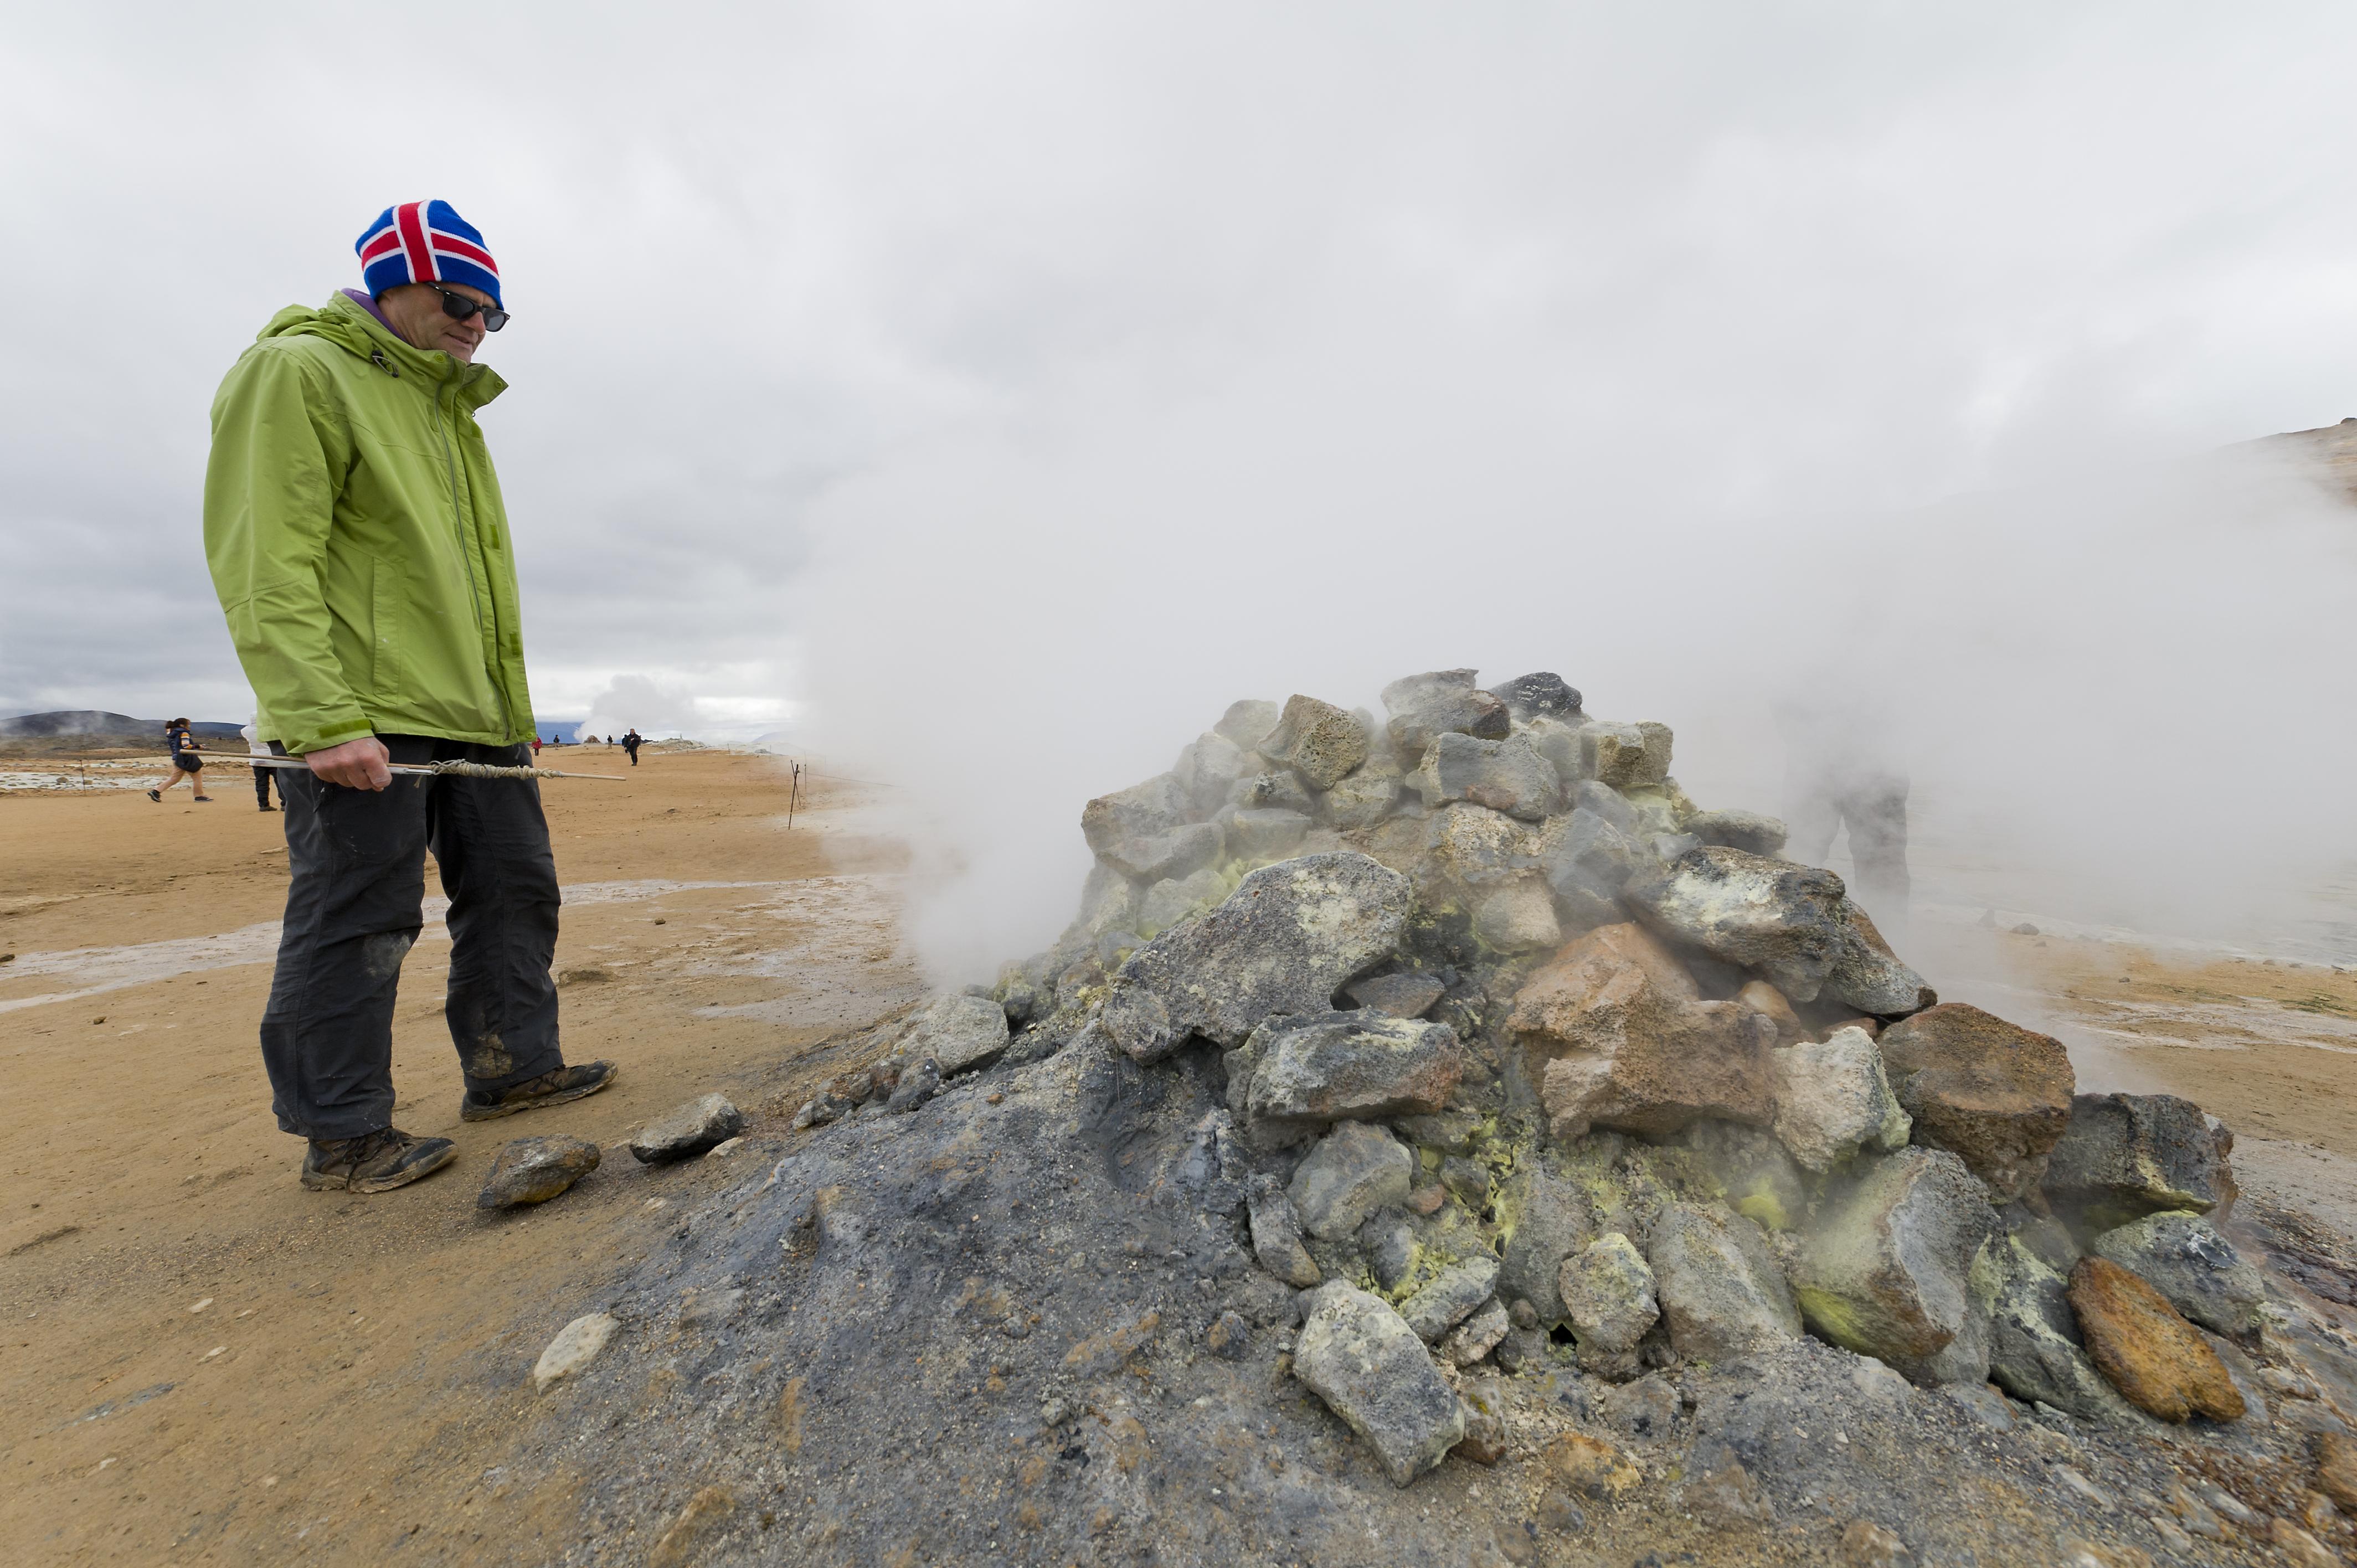 Europa, Island, Nordisland, Myvatn, Hochthermalgebiet Namafjall, Namaskard, Fumarole, Dampffumarole, Vulkanismus, Geothermie, geothermische Energie, WerbungPR, 7/2014